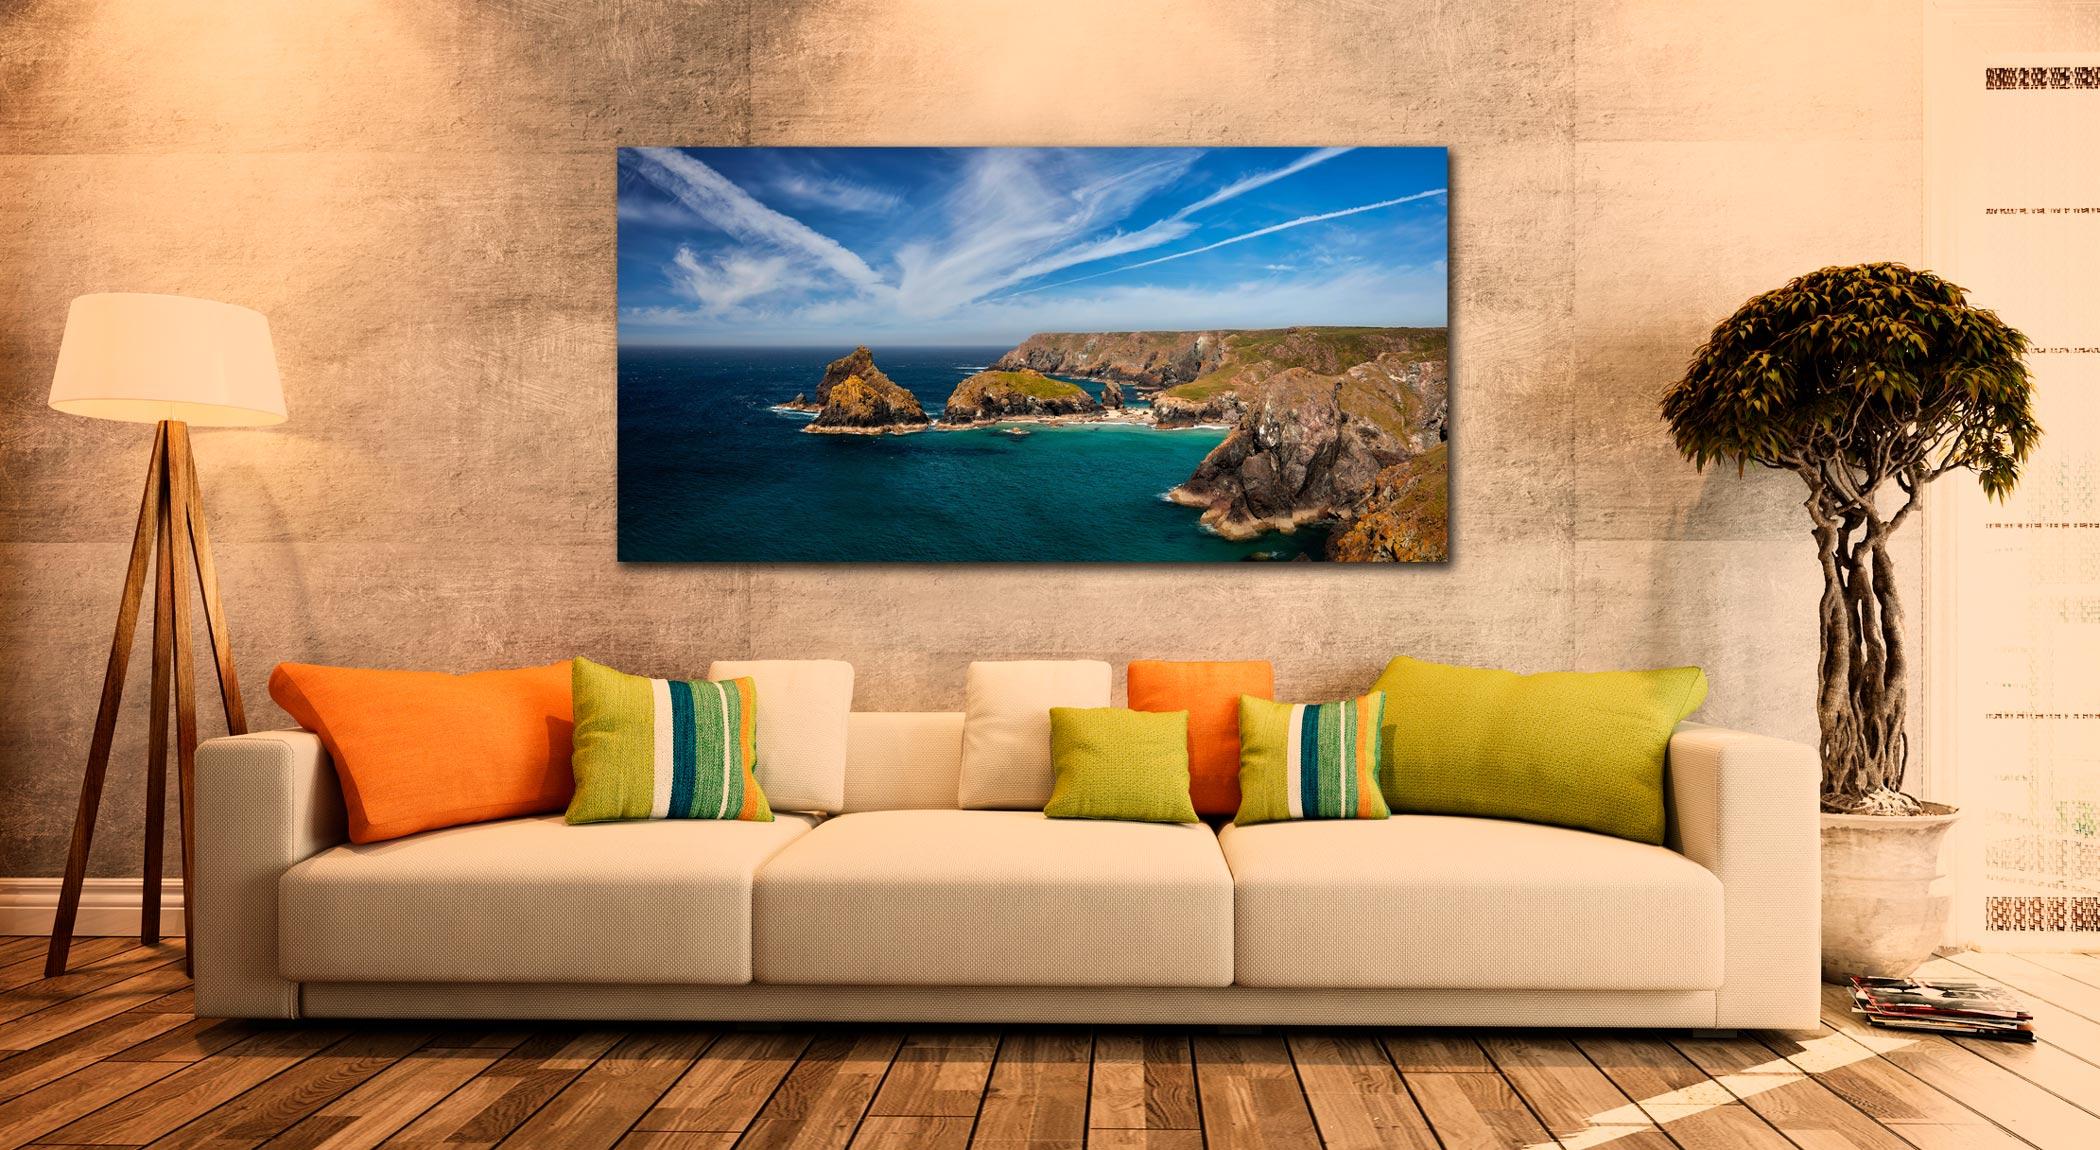 Green Ocean Kynance Cove - Print Aluminium Backing With Acrylic Glazing on Wall